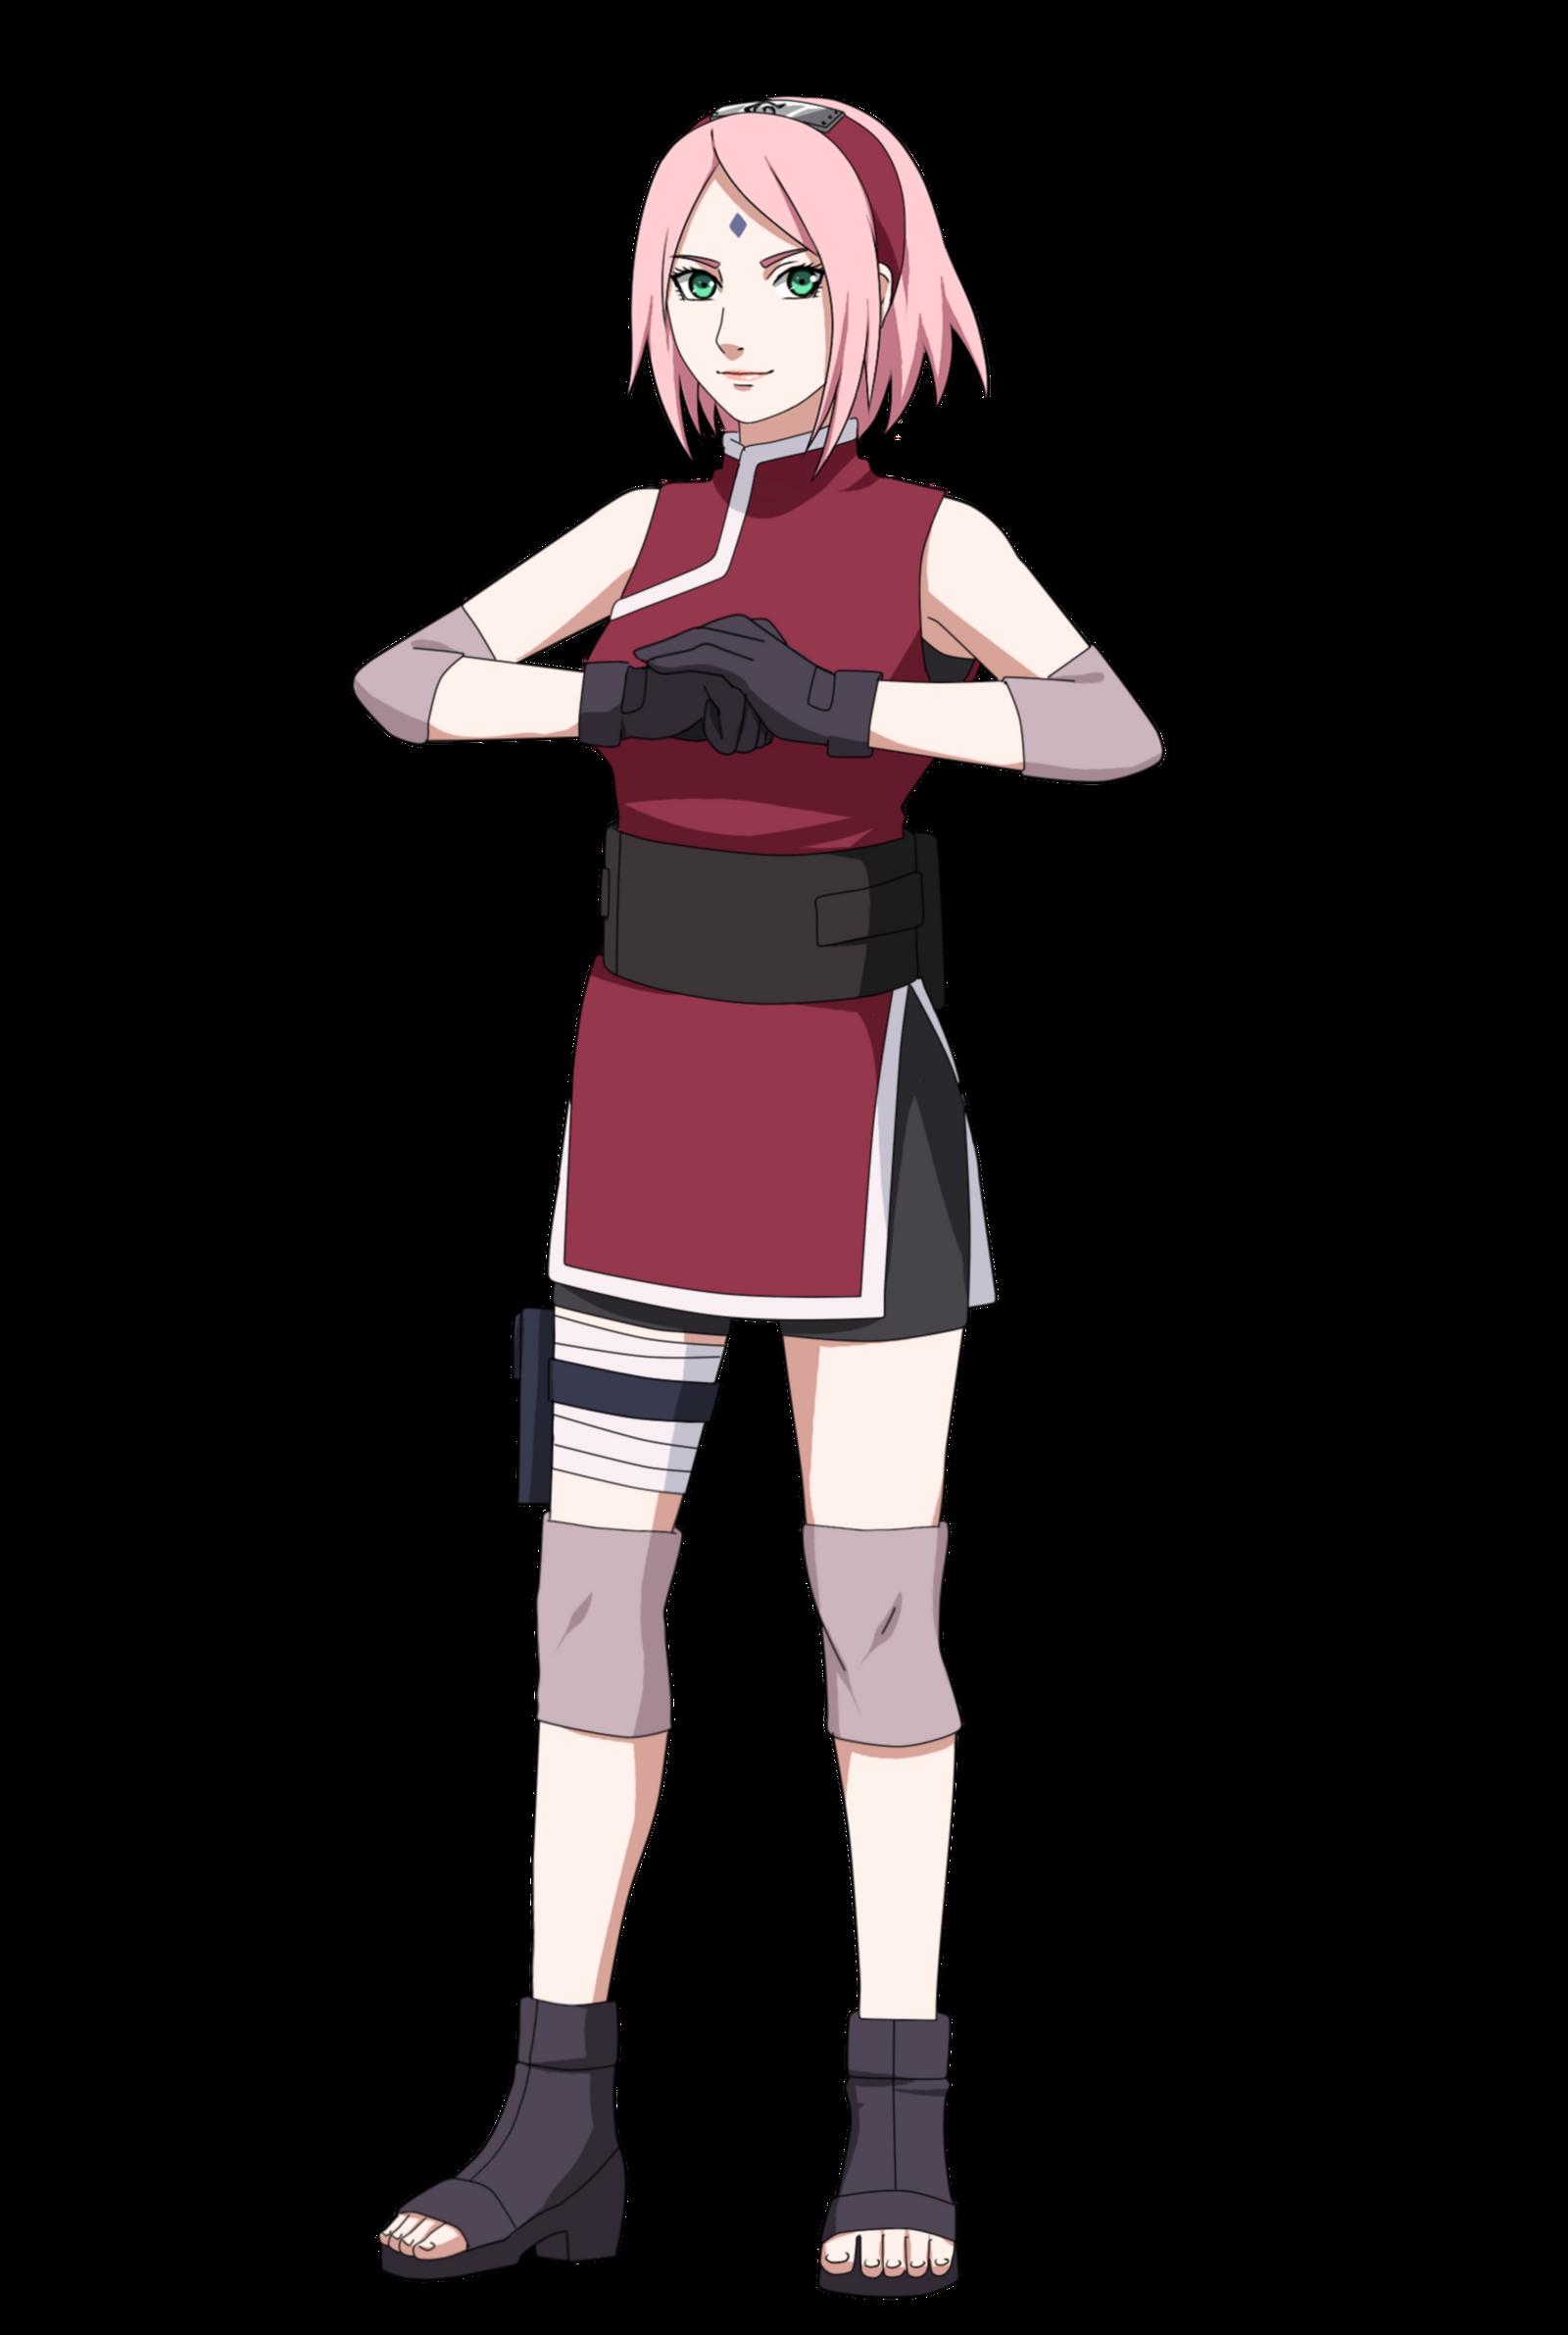 Сакура харуно её сиськи